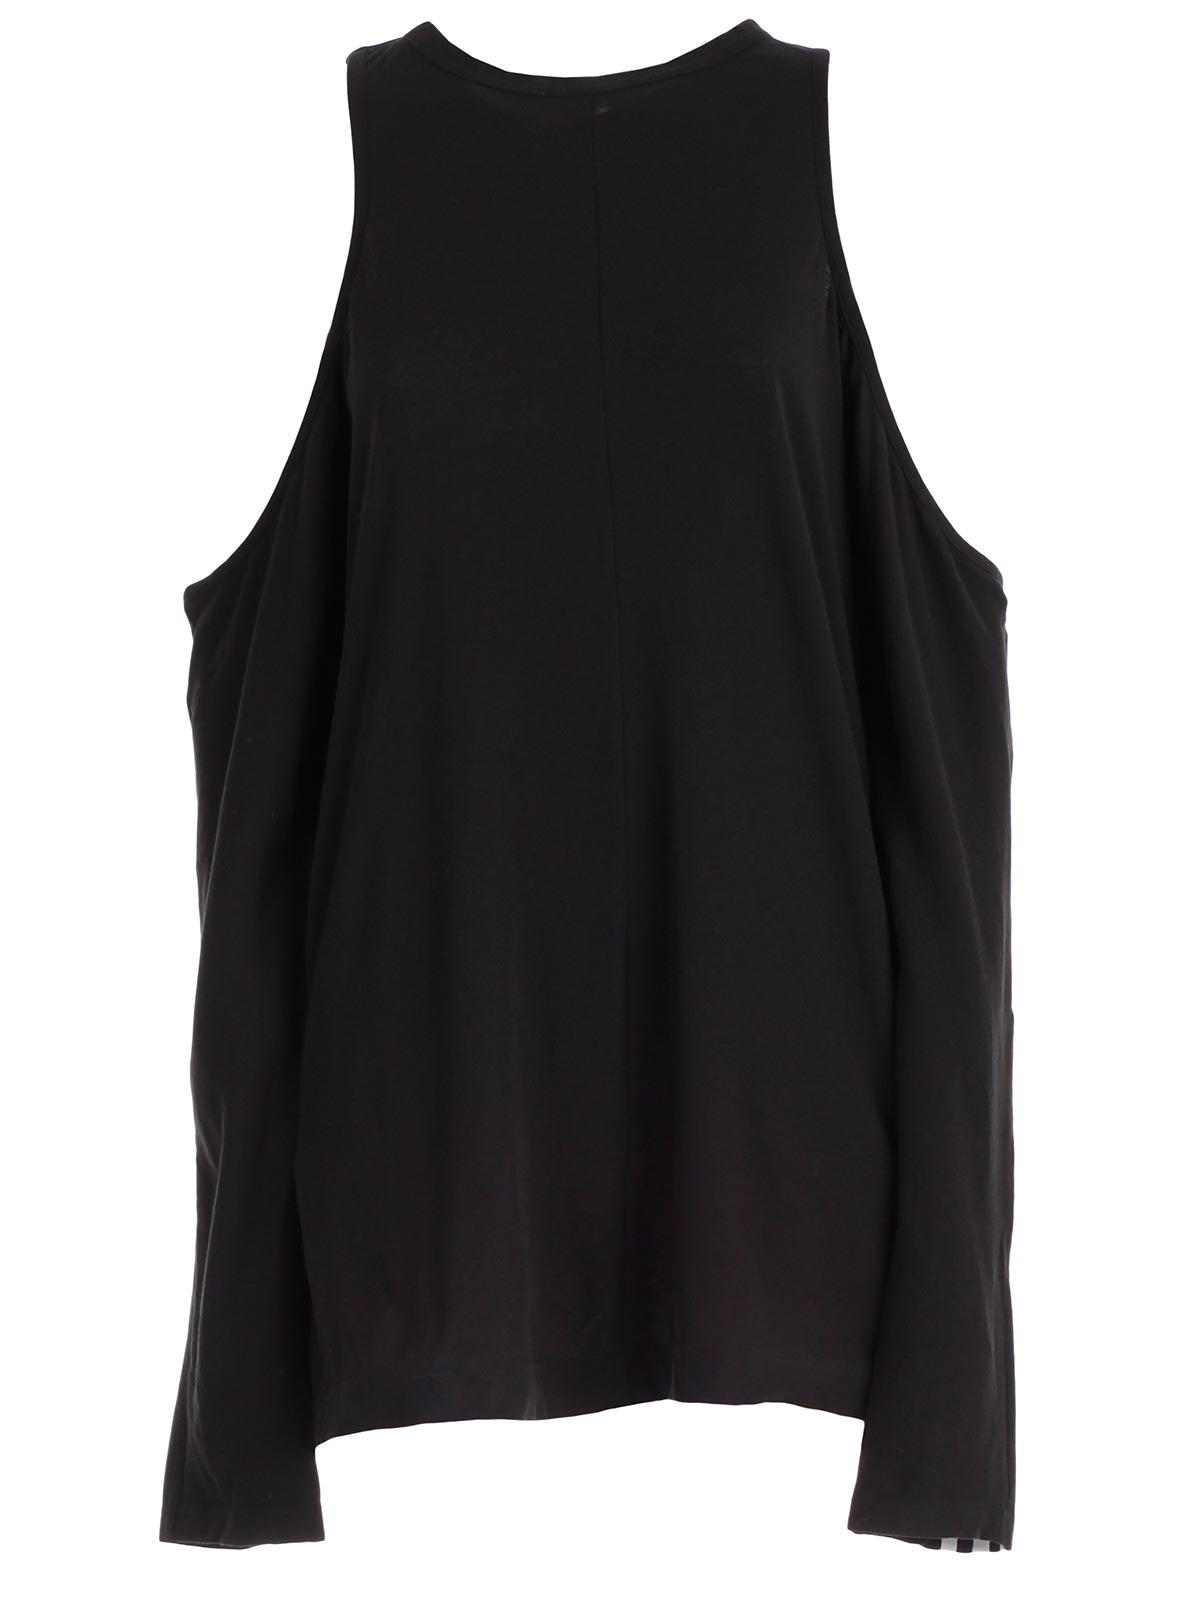 f5e42f38d9 Y-3 Yohji Yamamoto Adidas T- Shirt DY7208 - BLACK.Bernardelli Store ...